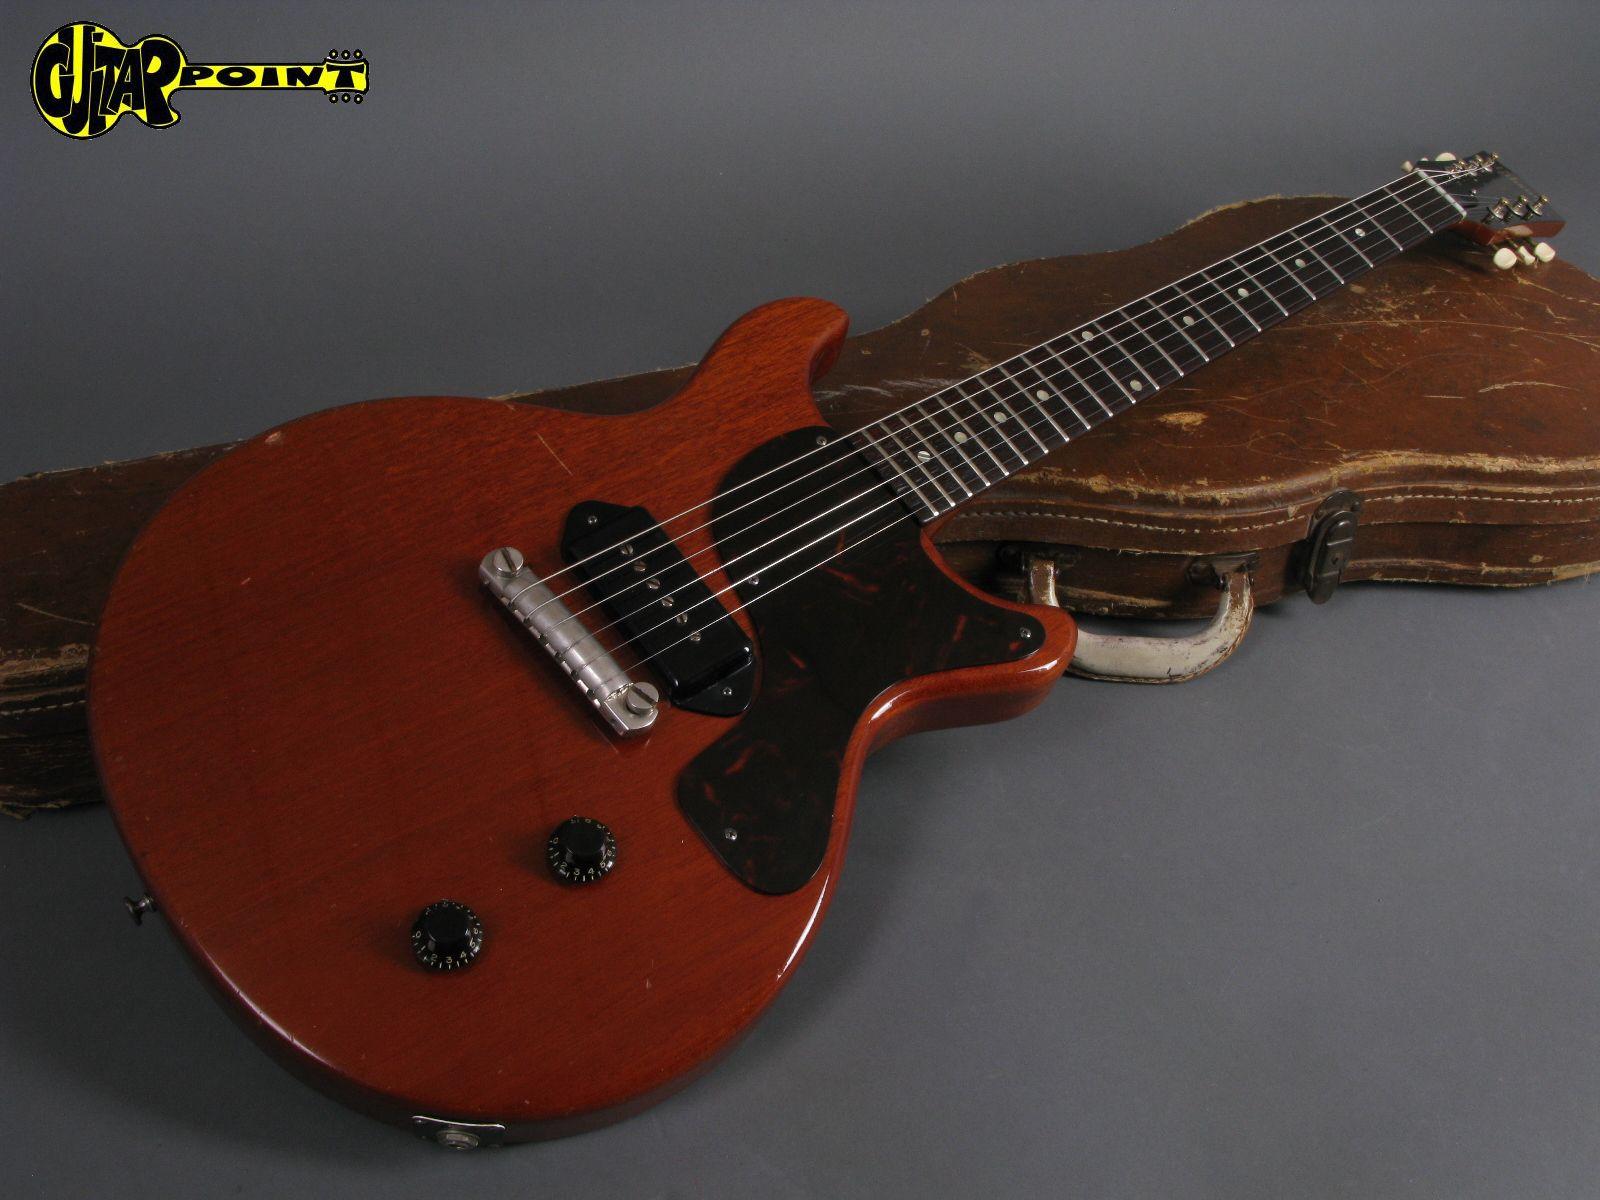 gibson les paul junior dc 1960 cherry guitar for sale. Black Bedroom Furniture Sets. Home Design Ideas